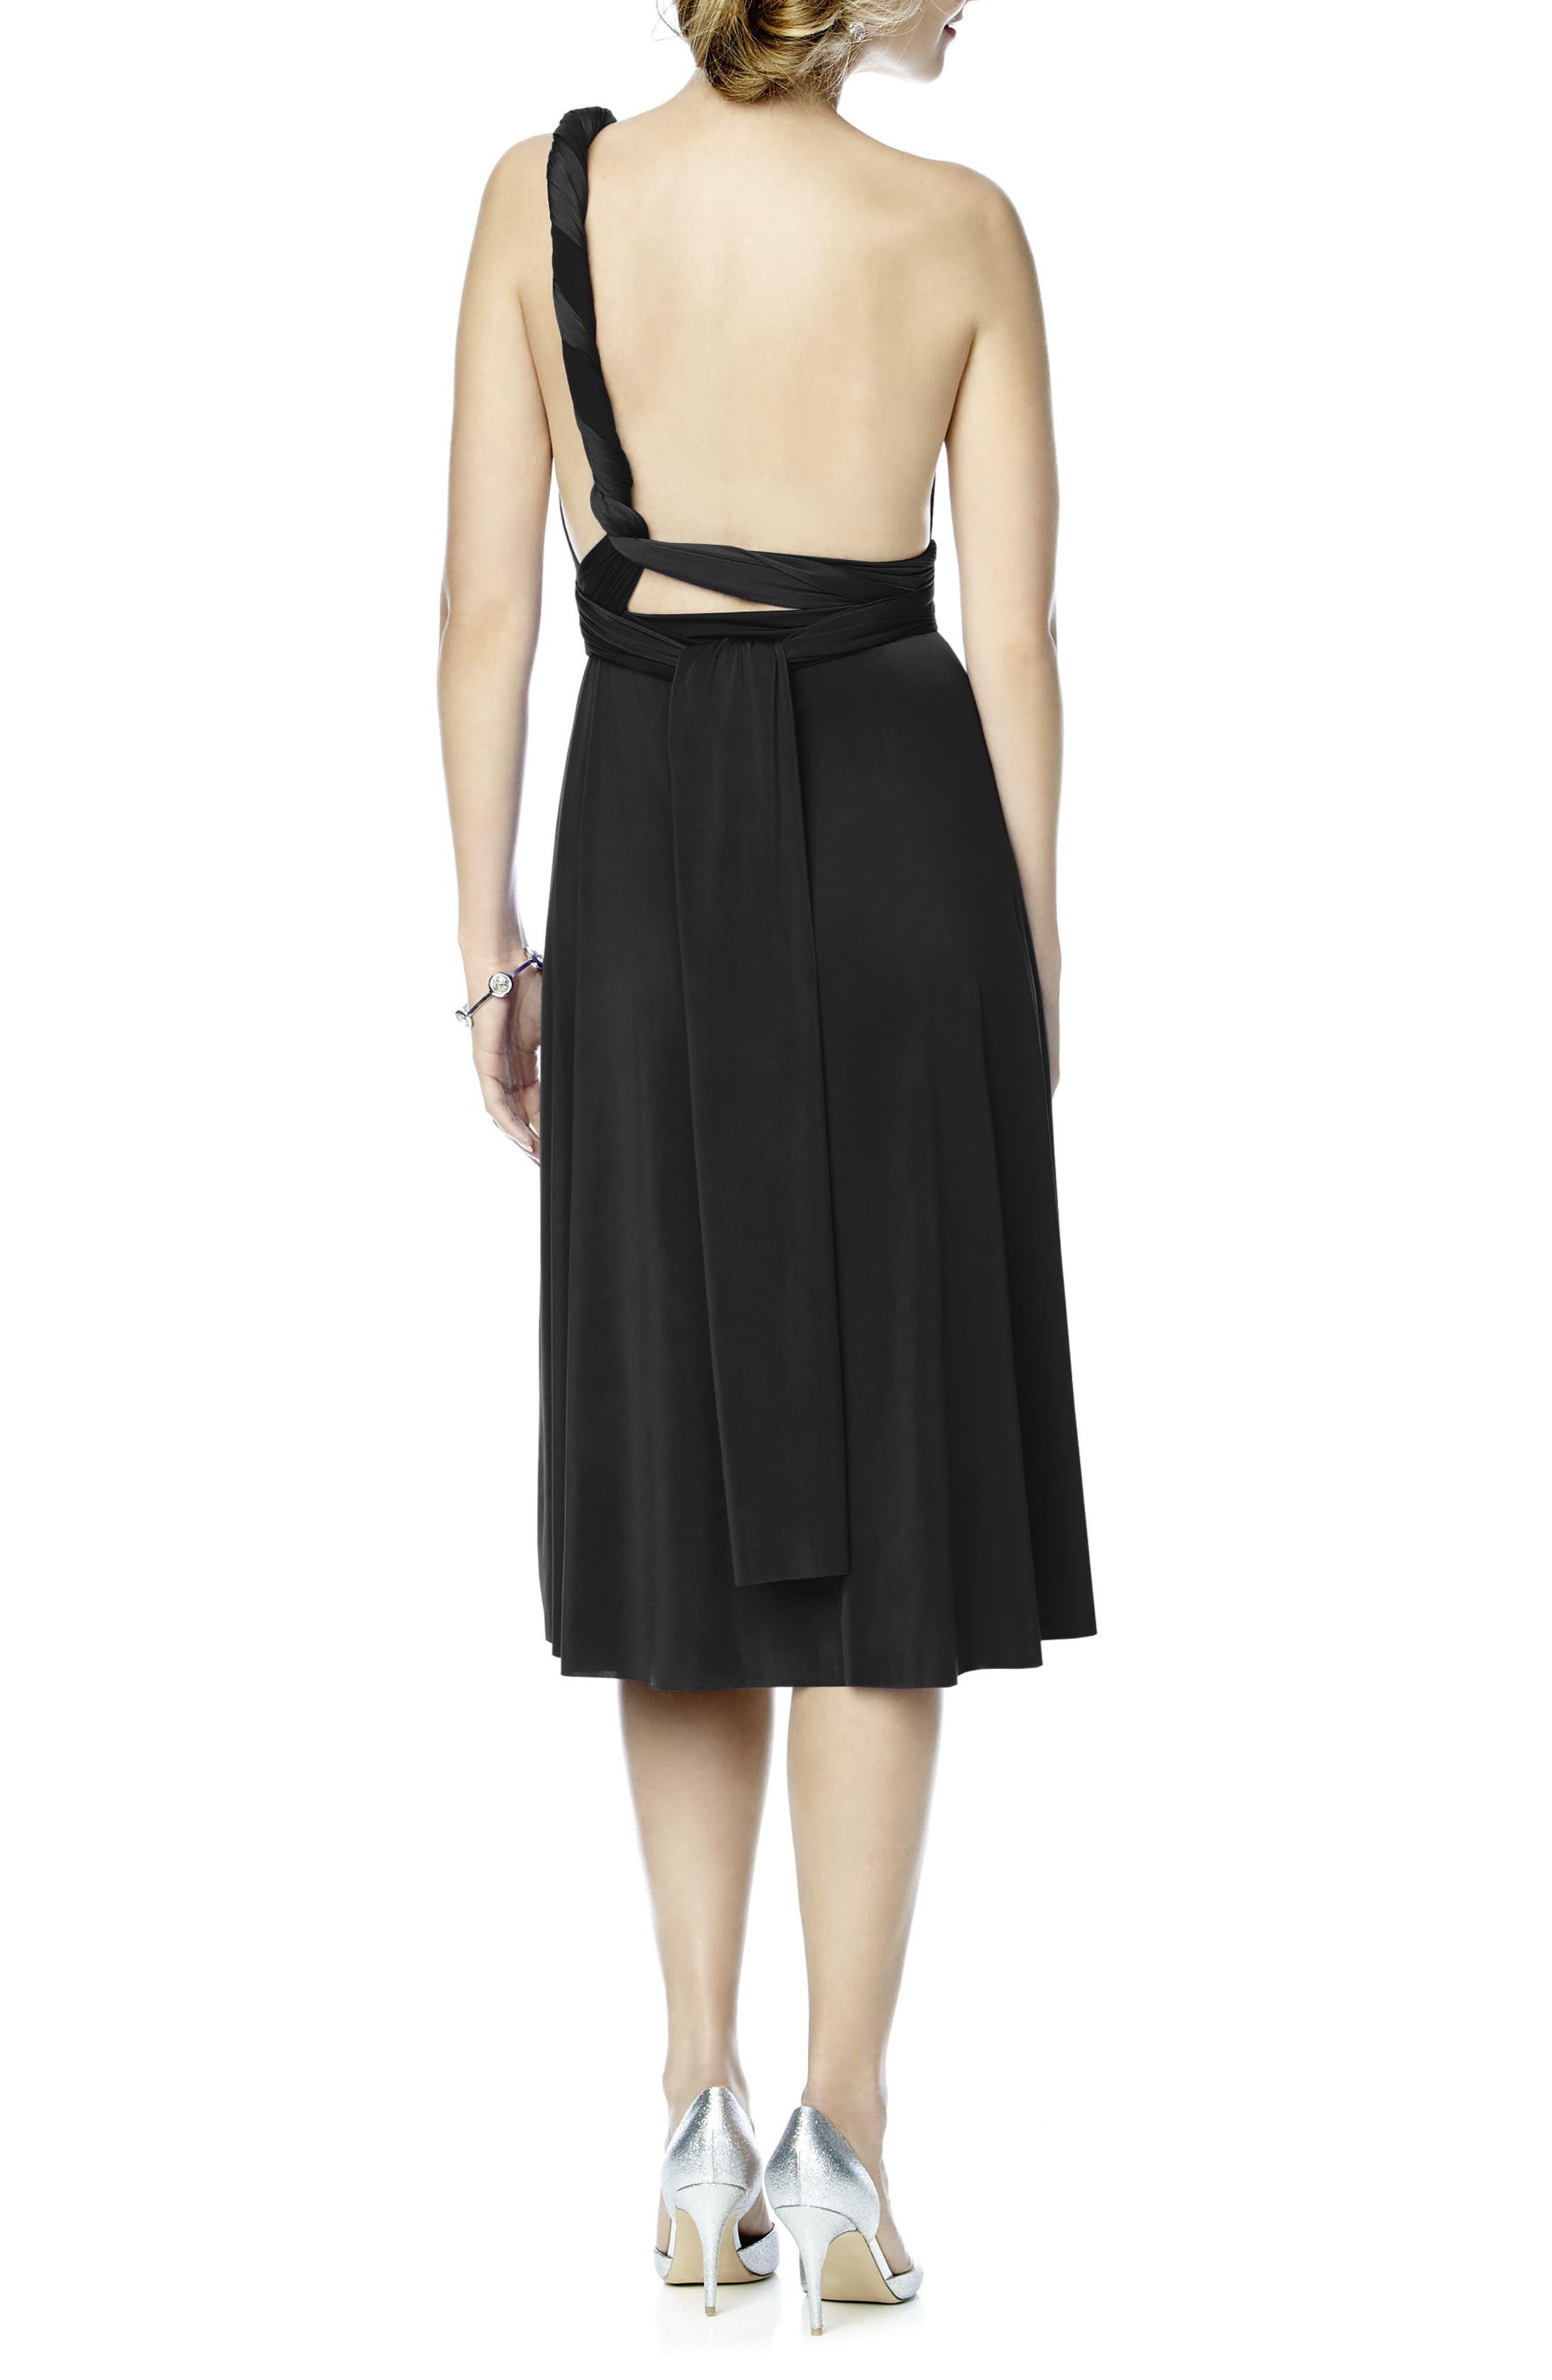 DESSY COLLECTION, Convertible Wrap Tie Surplice Jersey Dress, Alternate thumbnail 3, color, 001